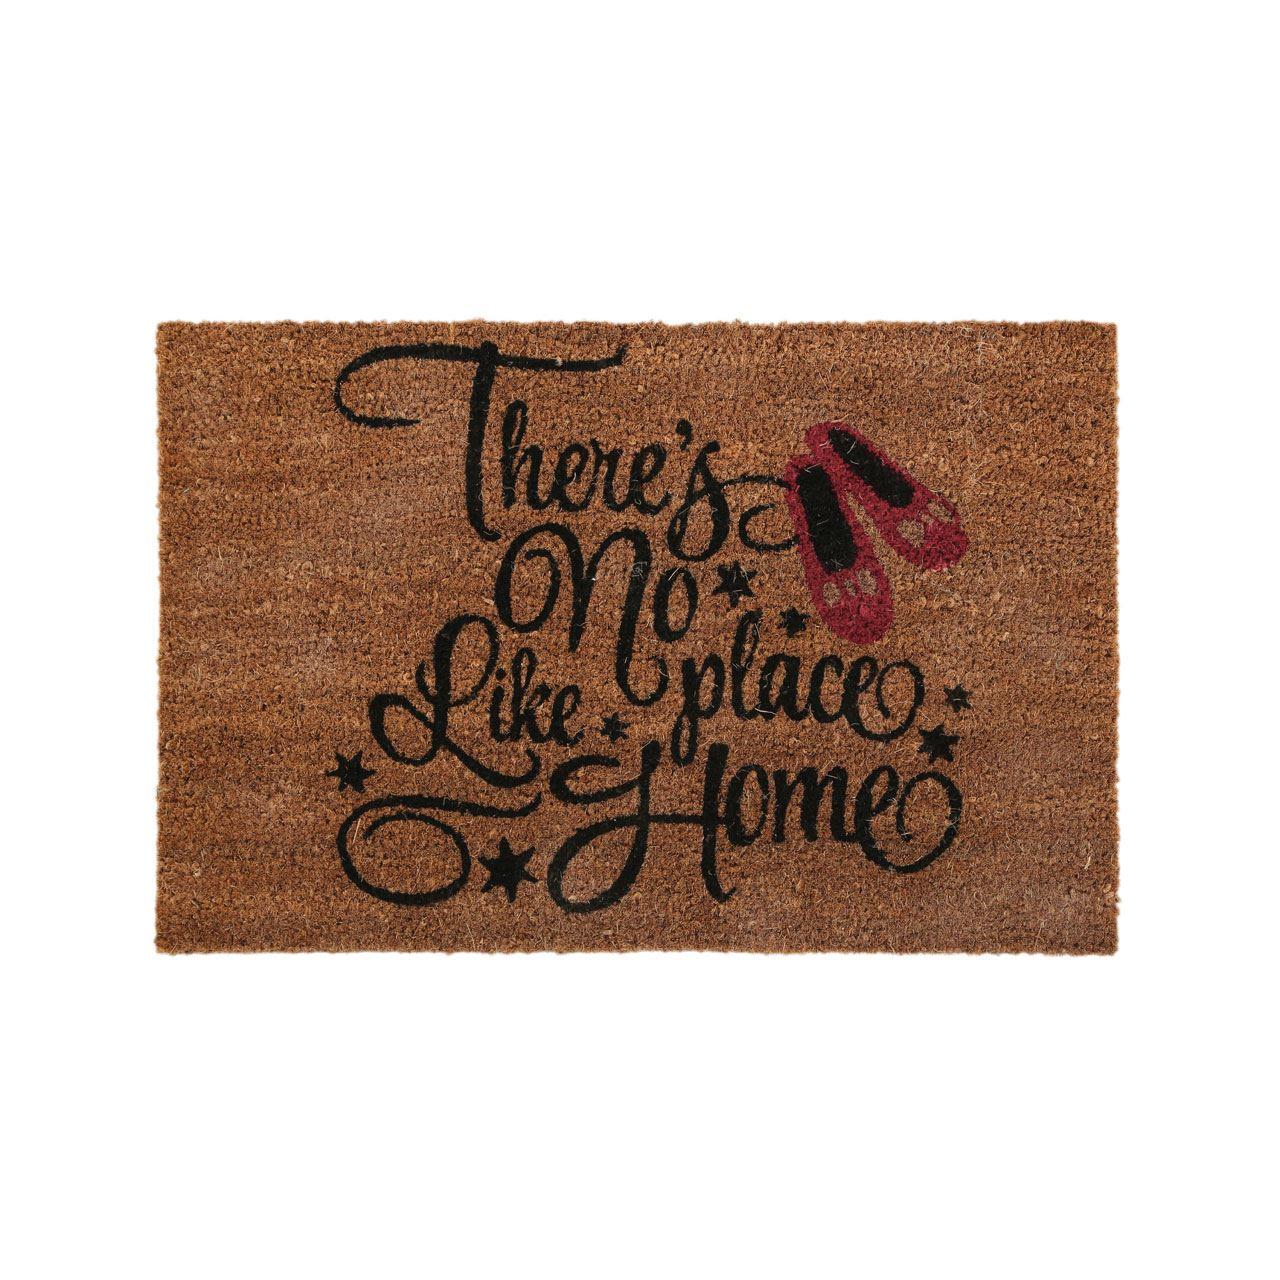 Dorothy Doormat,Pvc Backed Coir